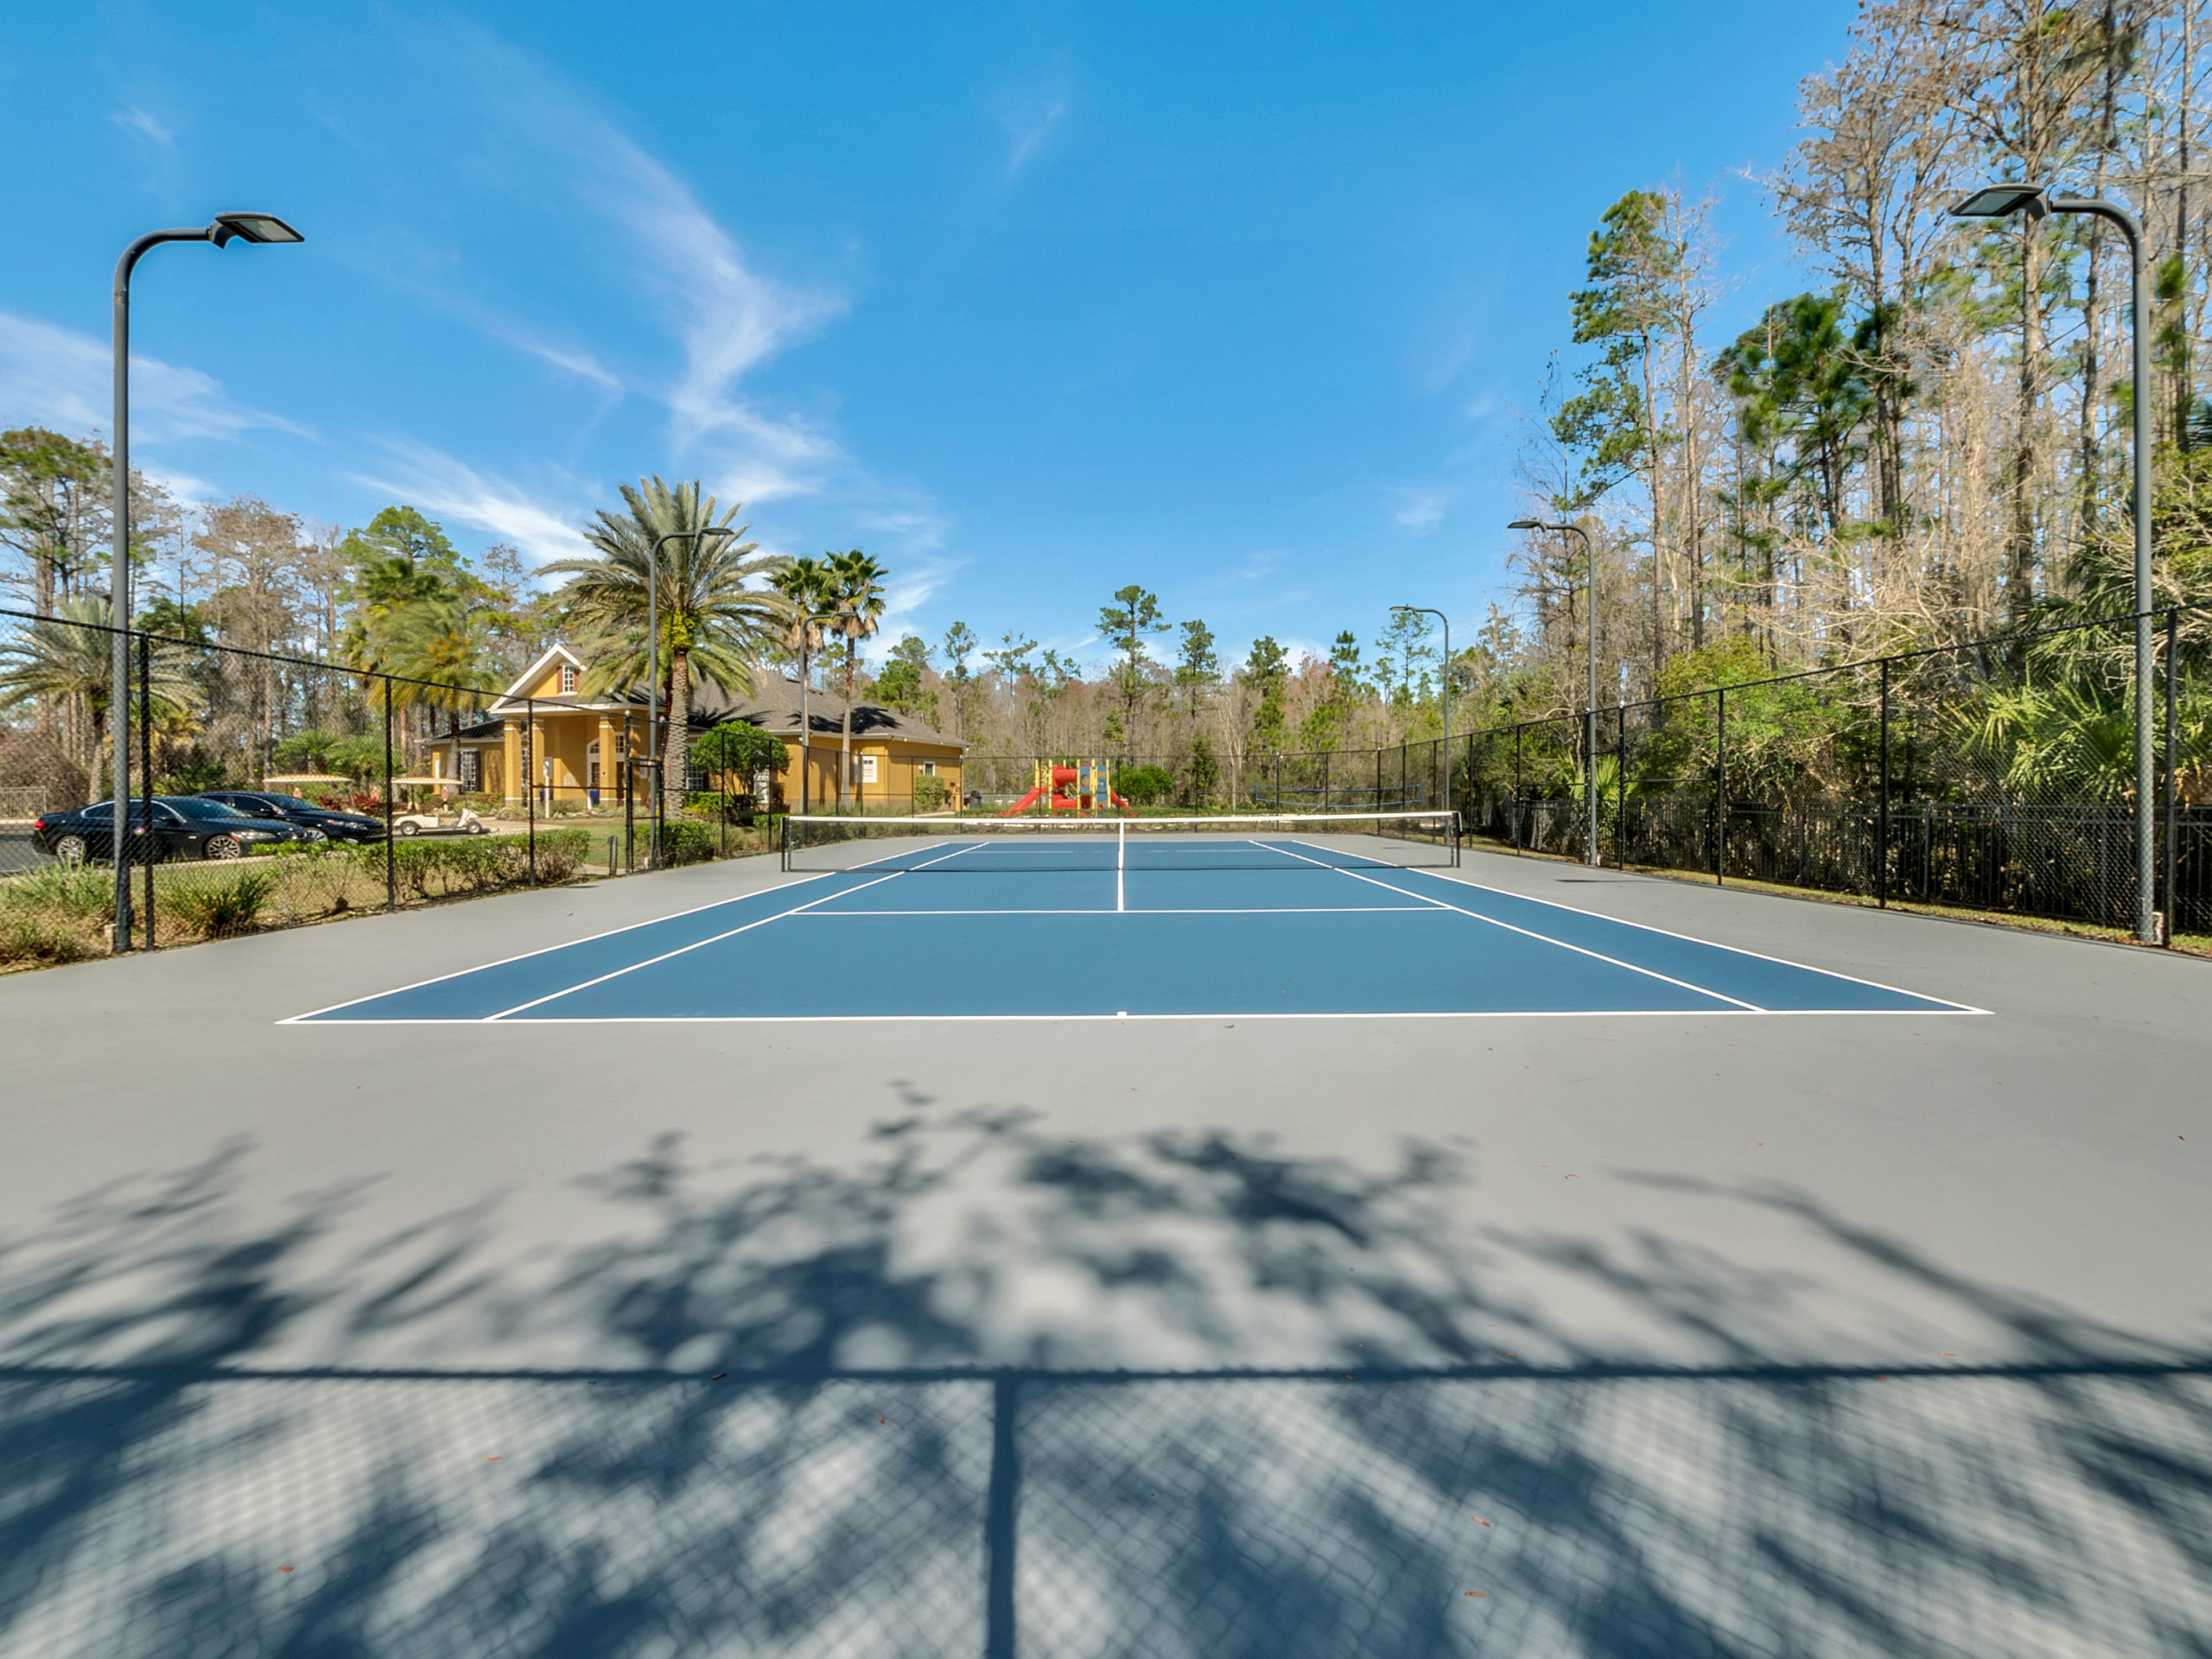 2802 Cheval St, Orlando, FL 32828